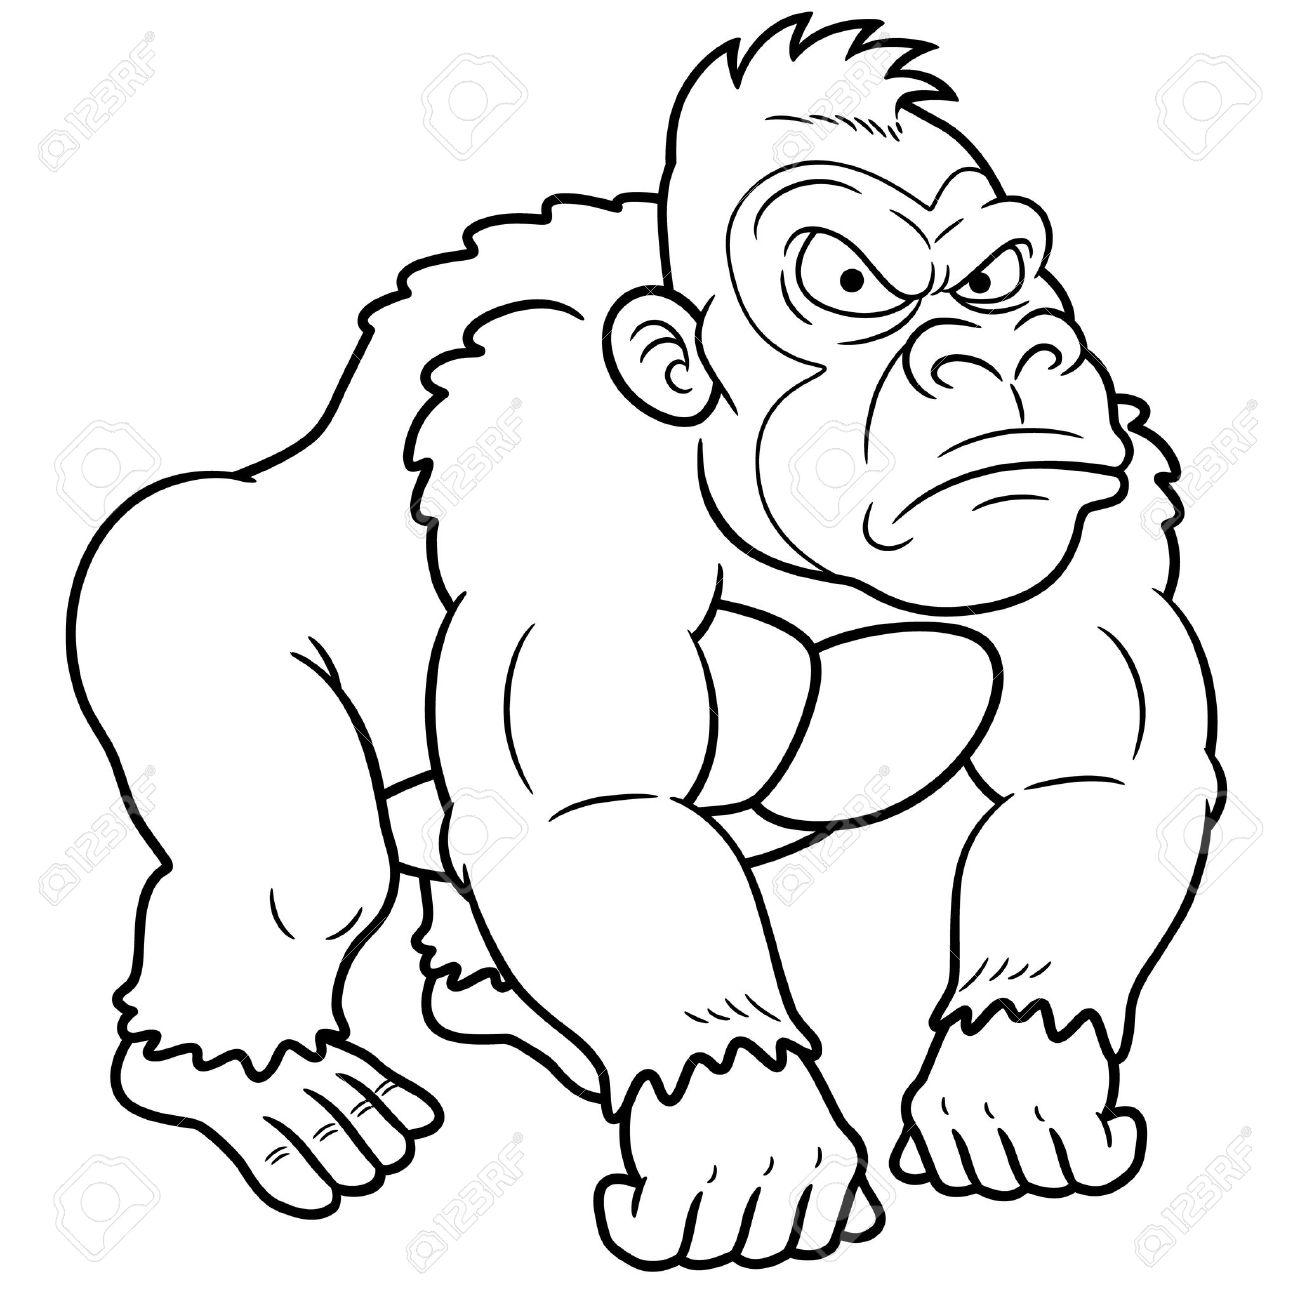 Coloring pages gorilla - Gorilla Illustration Illustration Of Gorilla Cartoon Coloring Book Illustration